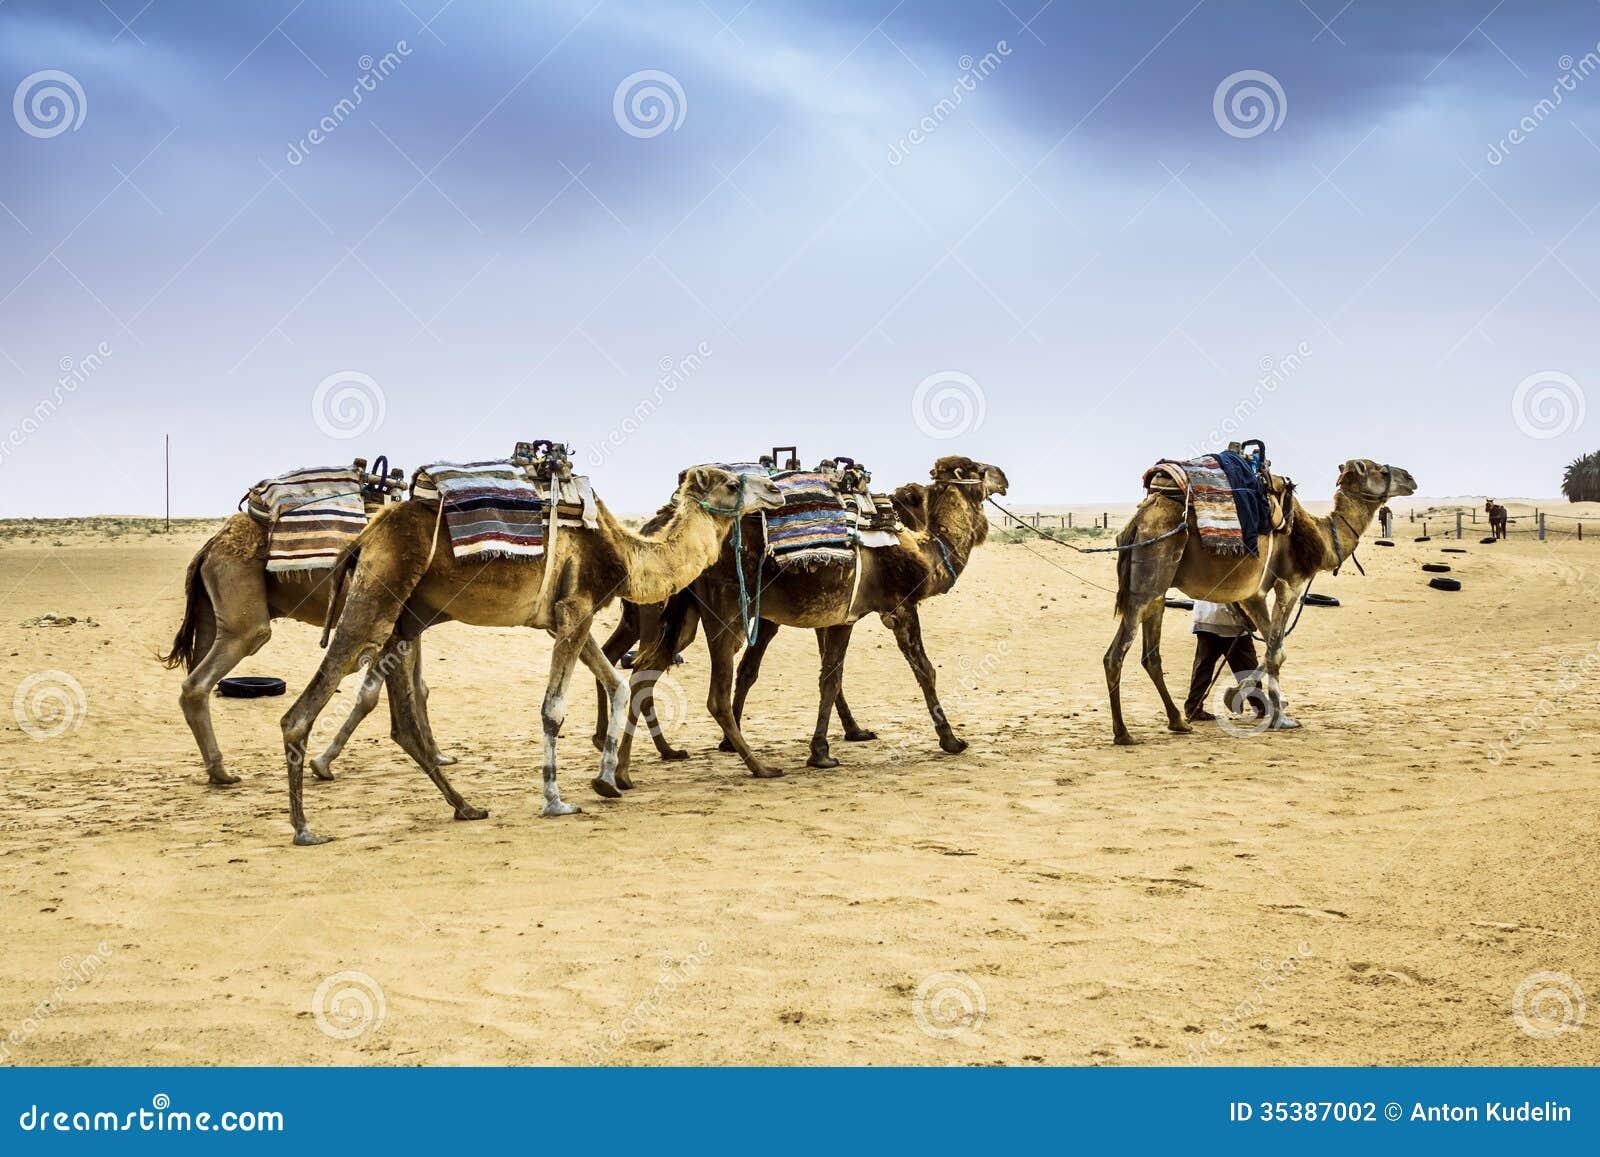 Lastest Camel Caravan On The Sahara Desert In The Tunisia  Stock Photo